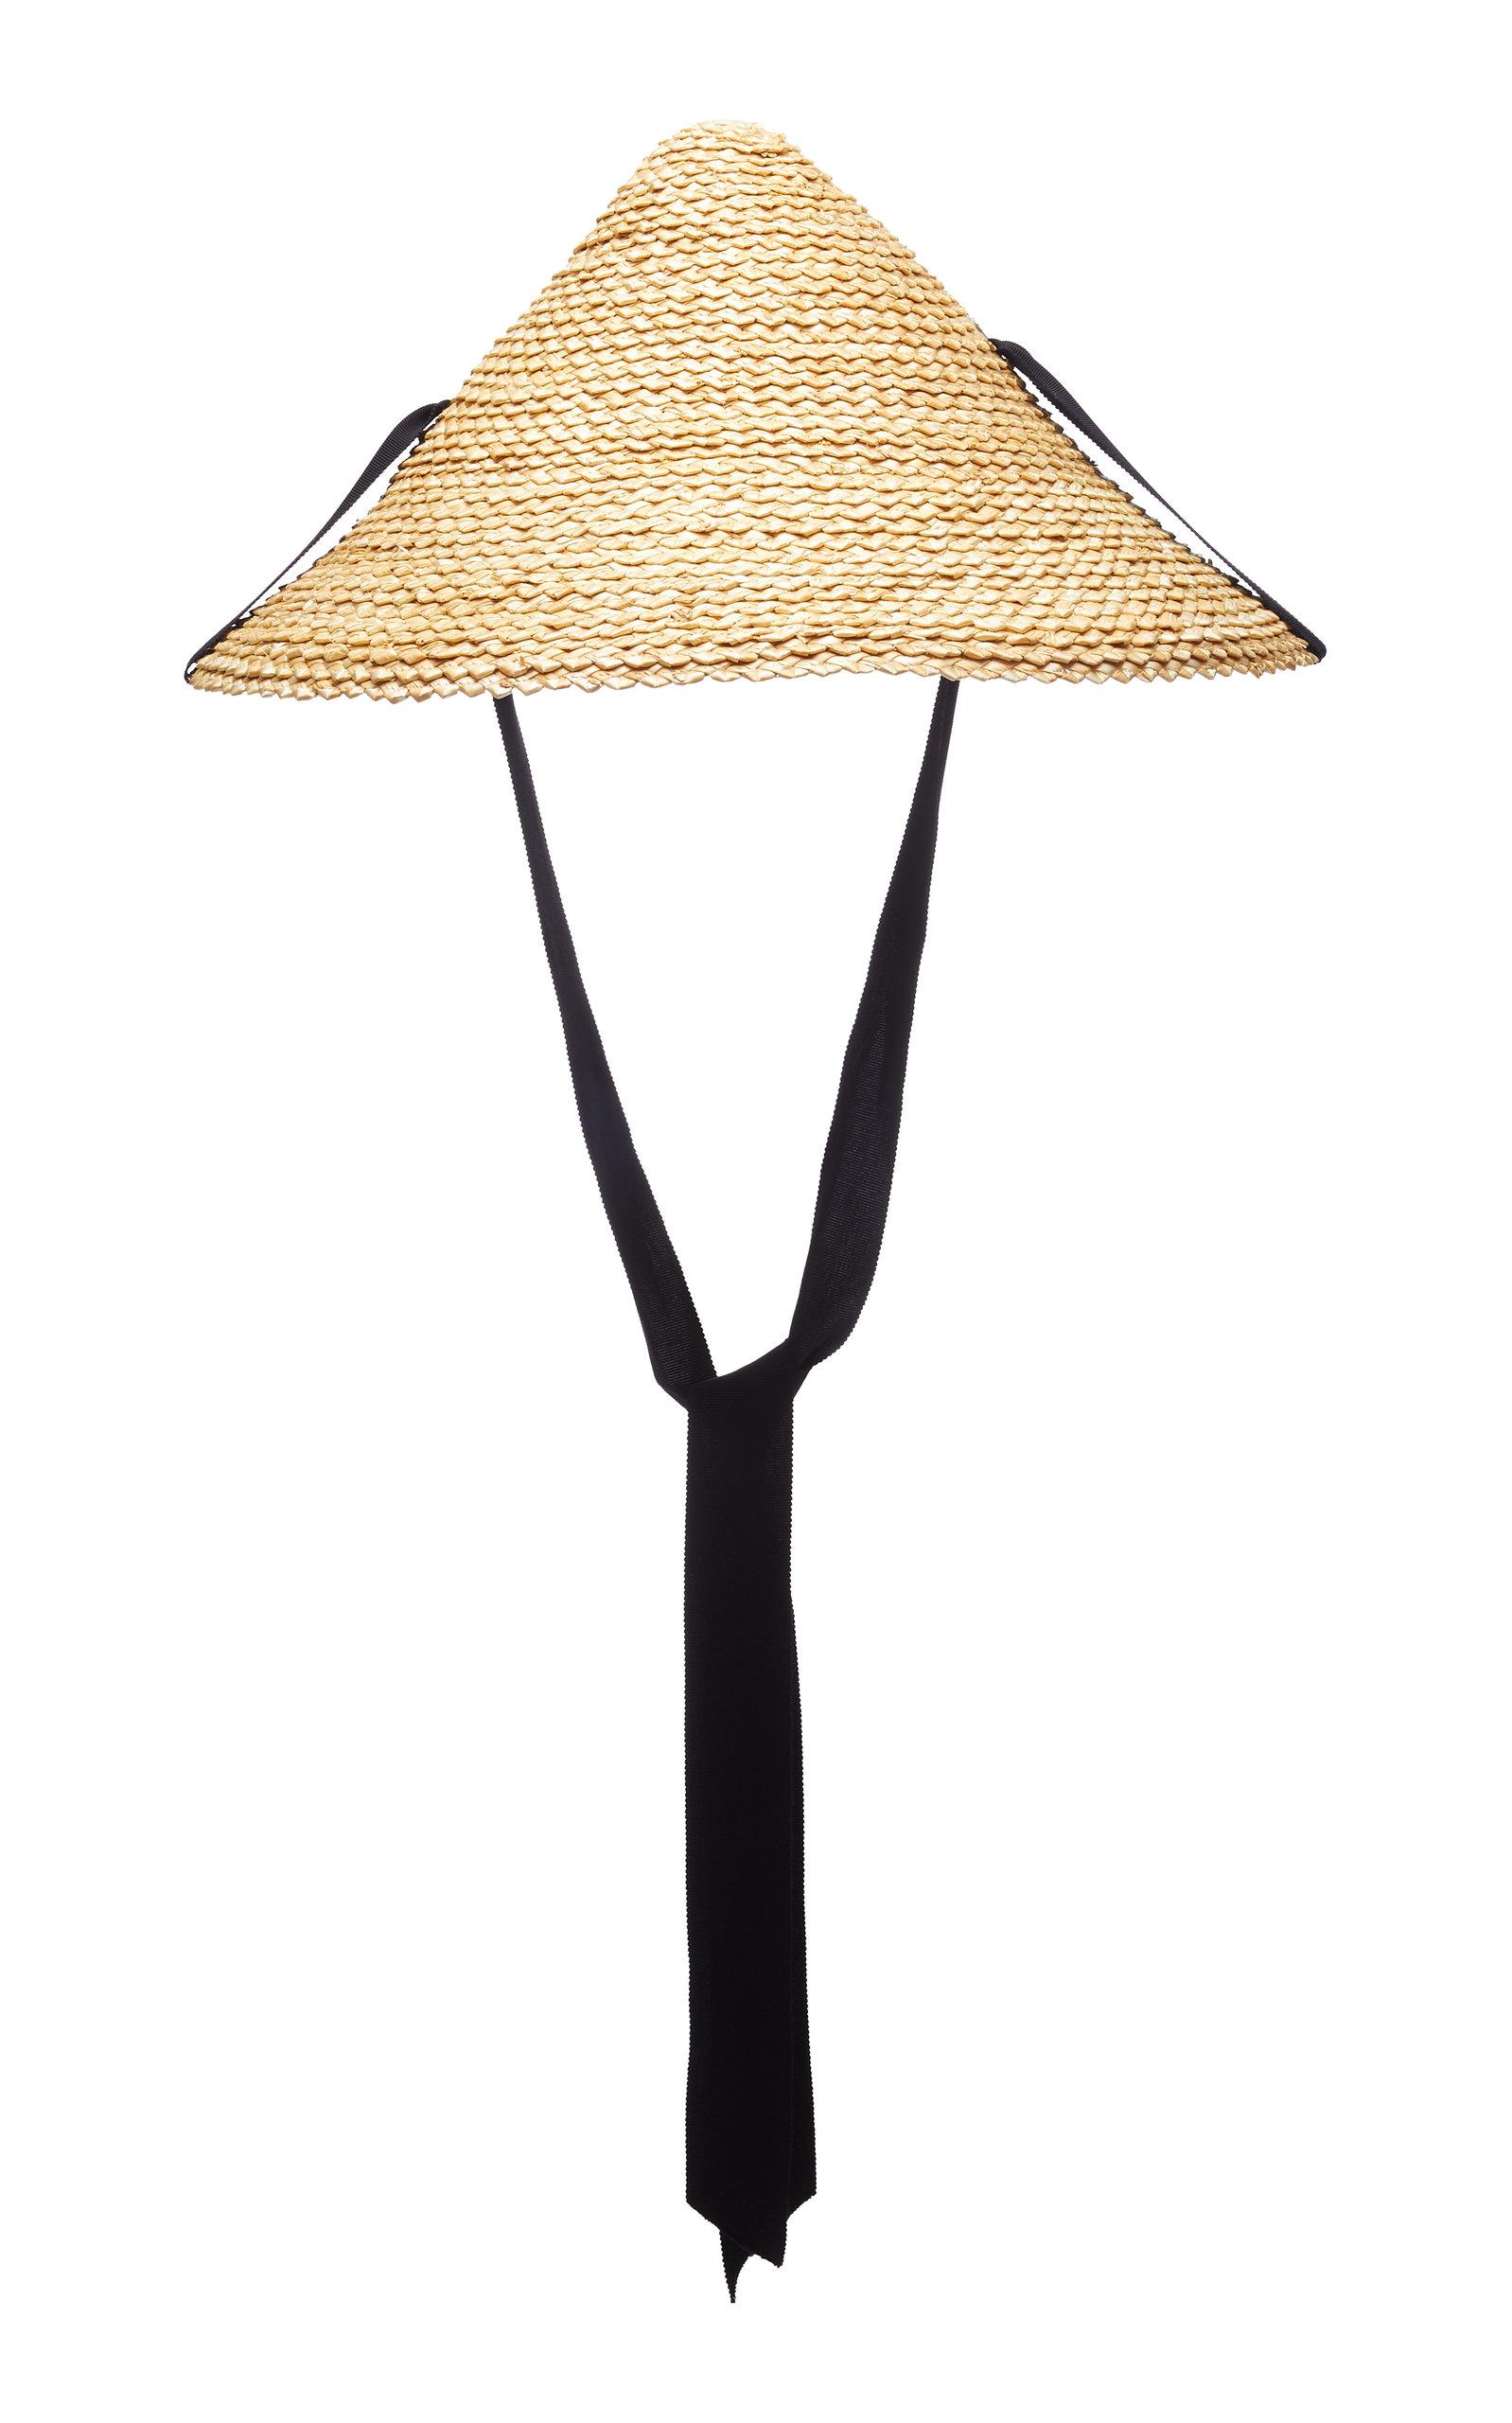 Lola Hats PINECONE STRAW HAT